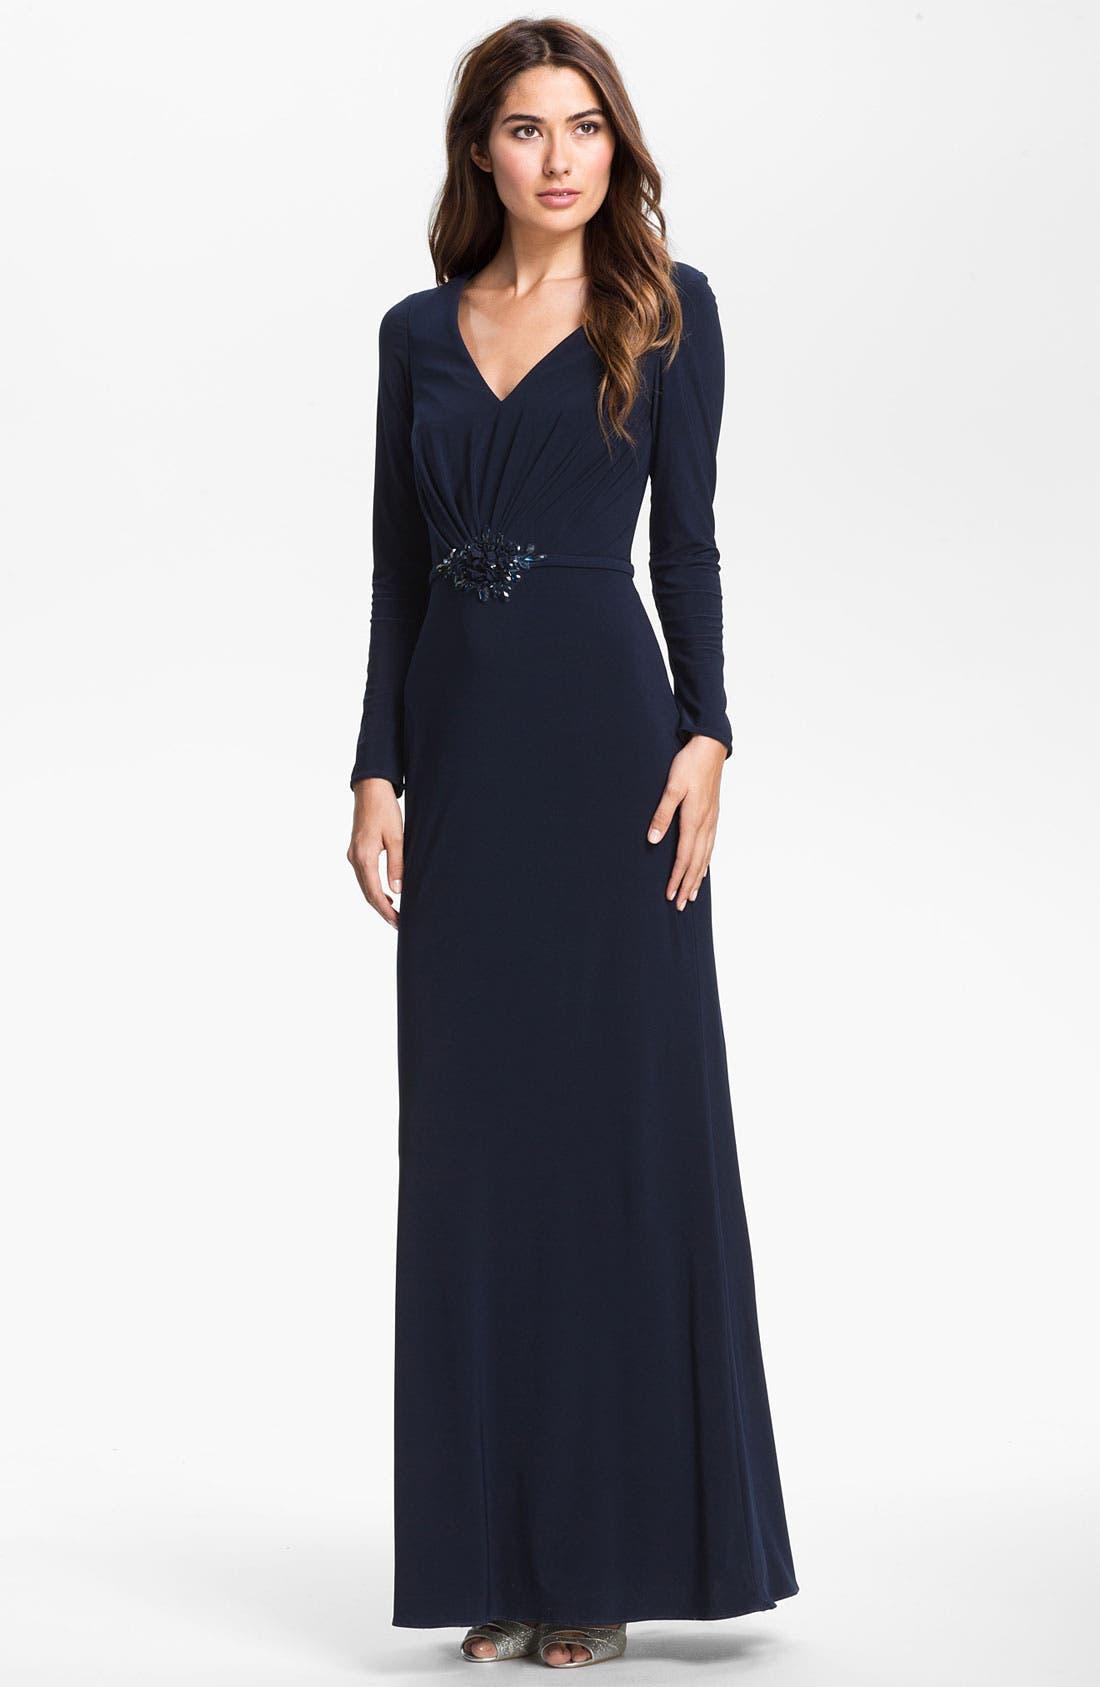 Main Image - Kathy Hilton Embellished Long Sleeve Jersey Gown